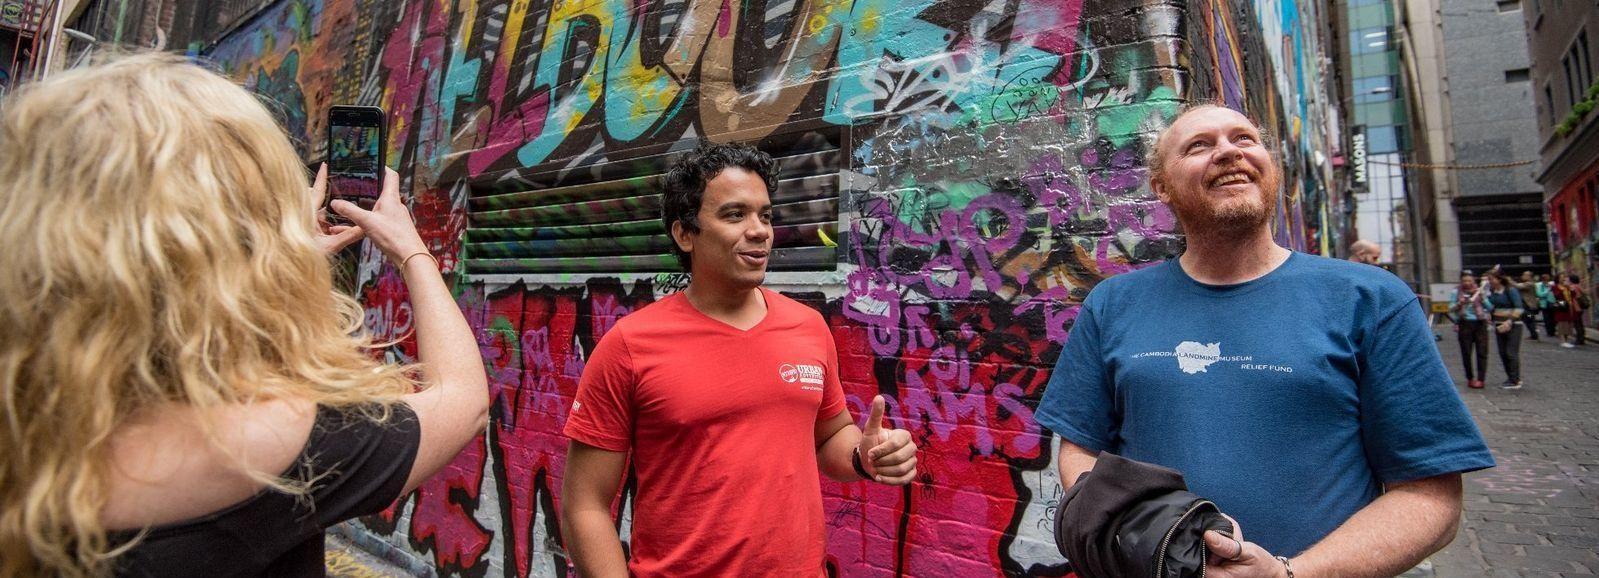 Melbourne: Bites & Sights Tour with Eureka Skydeck